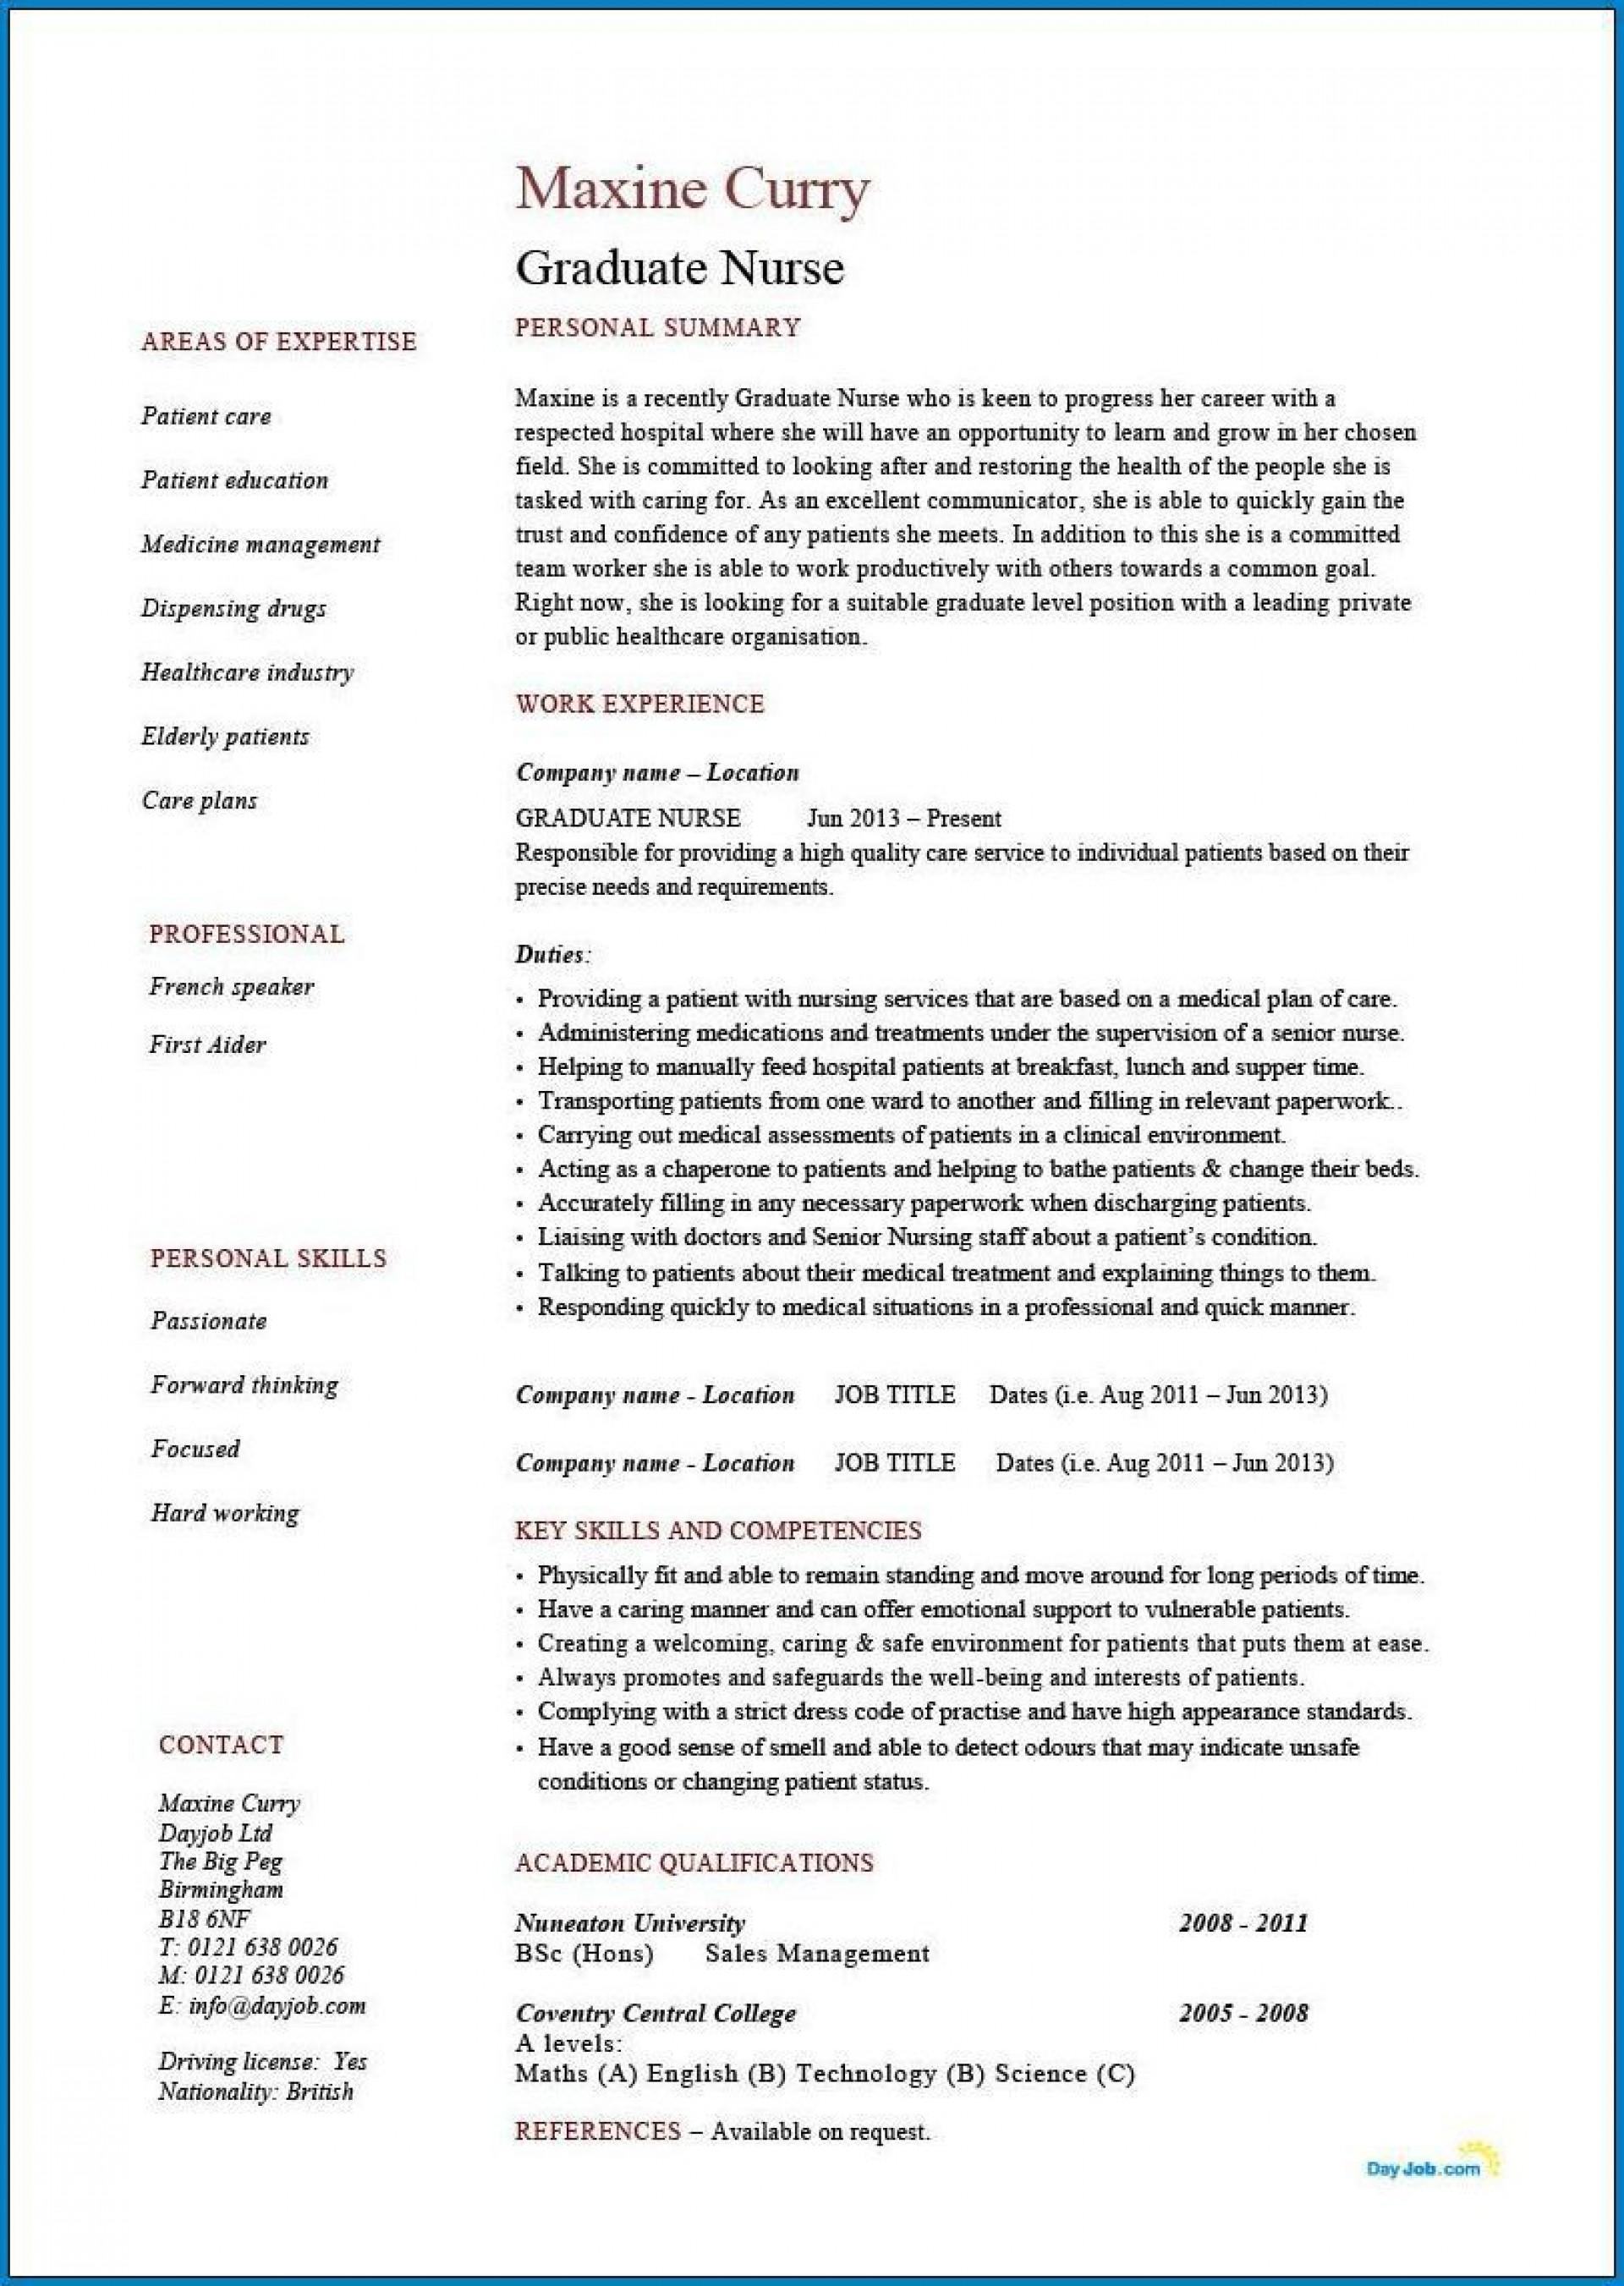 004 Phenomenal Rn Graduate Resume Template Inspiration  New Grad Nurse1920